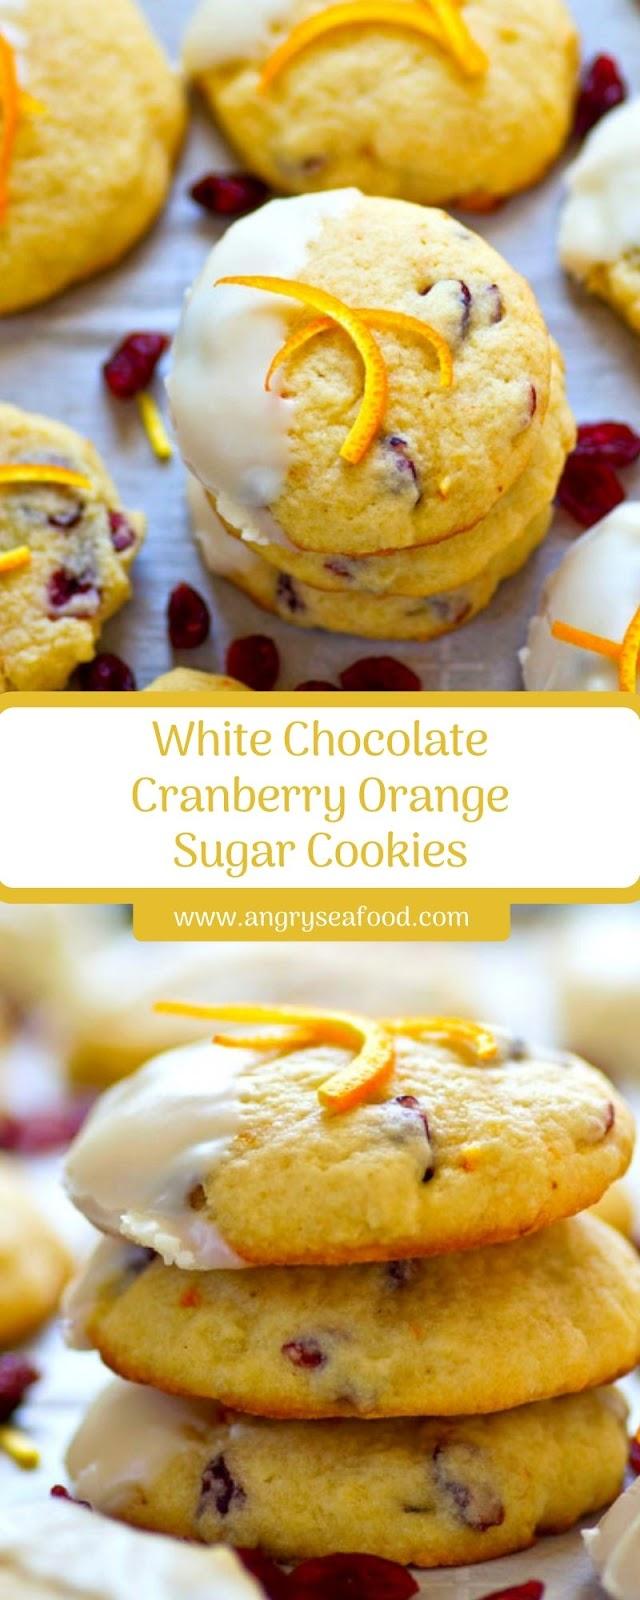 White Chocolate Cranberry Orange Sugar Cookies